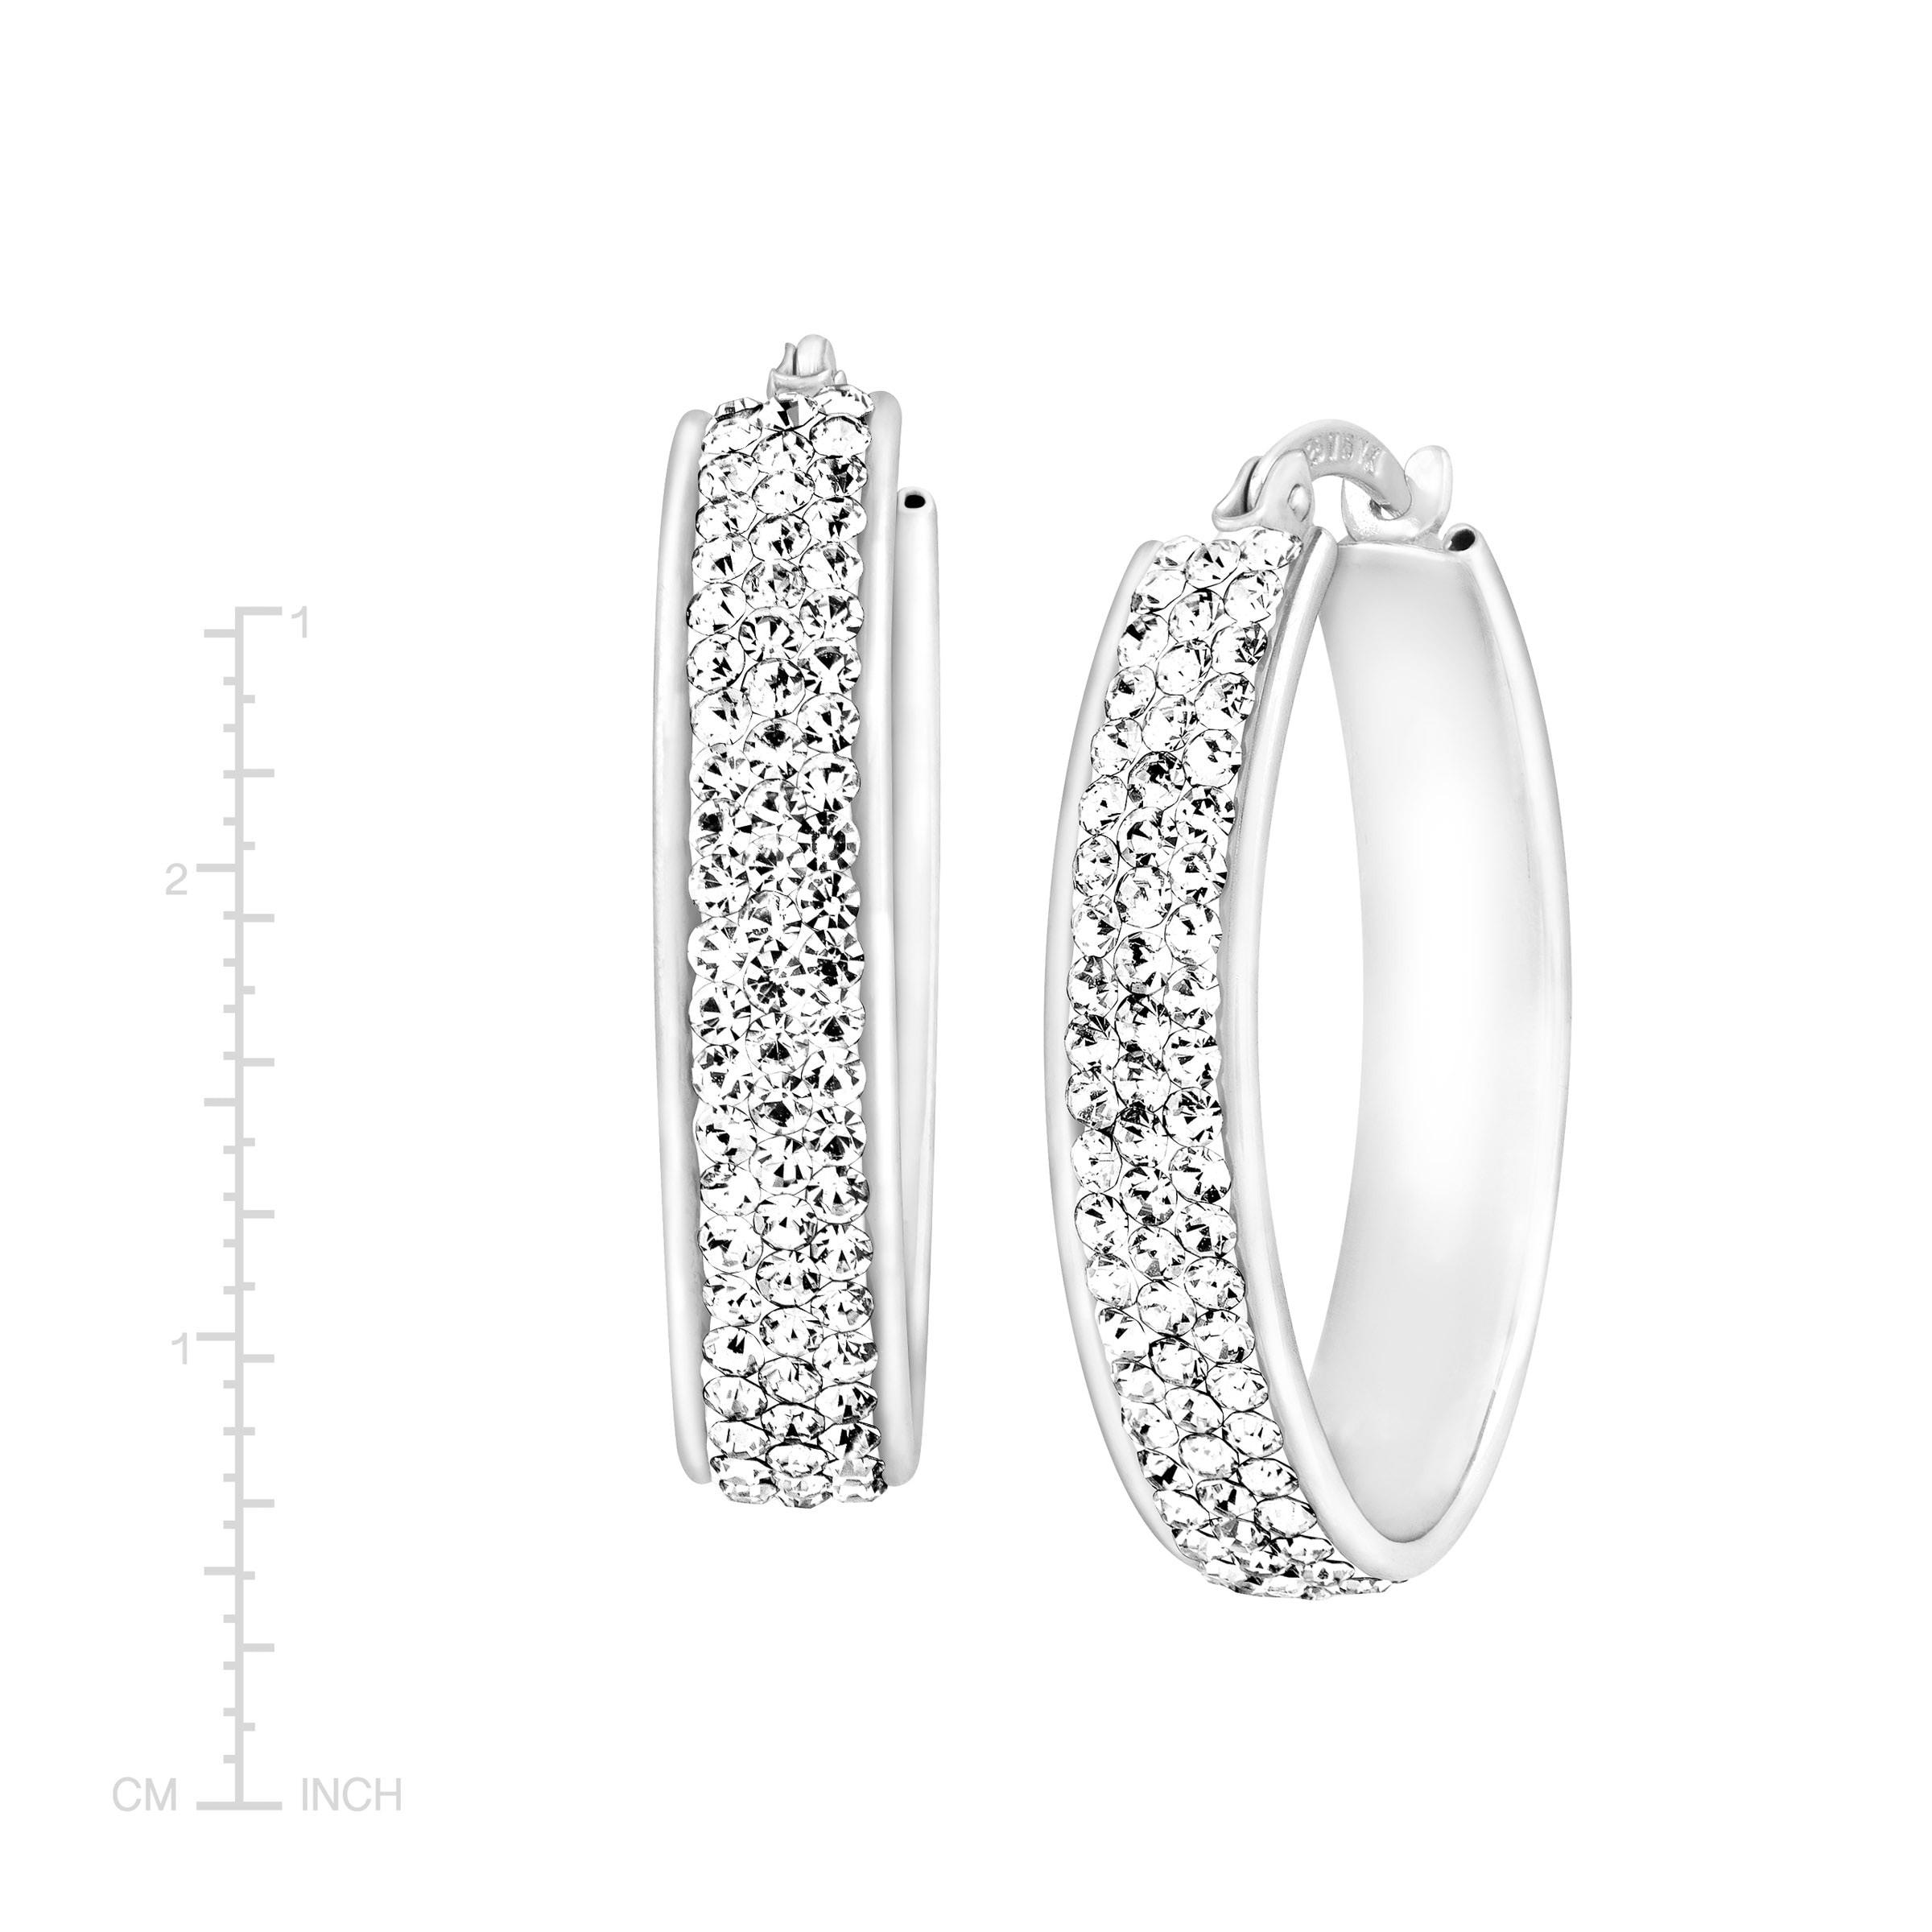 Ss Sm In//Outside All White Crystal Hoops Hoop Earrings